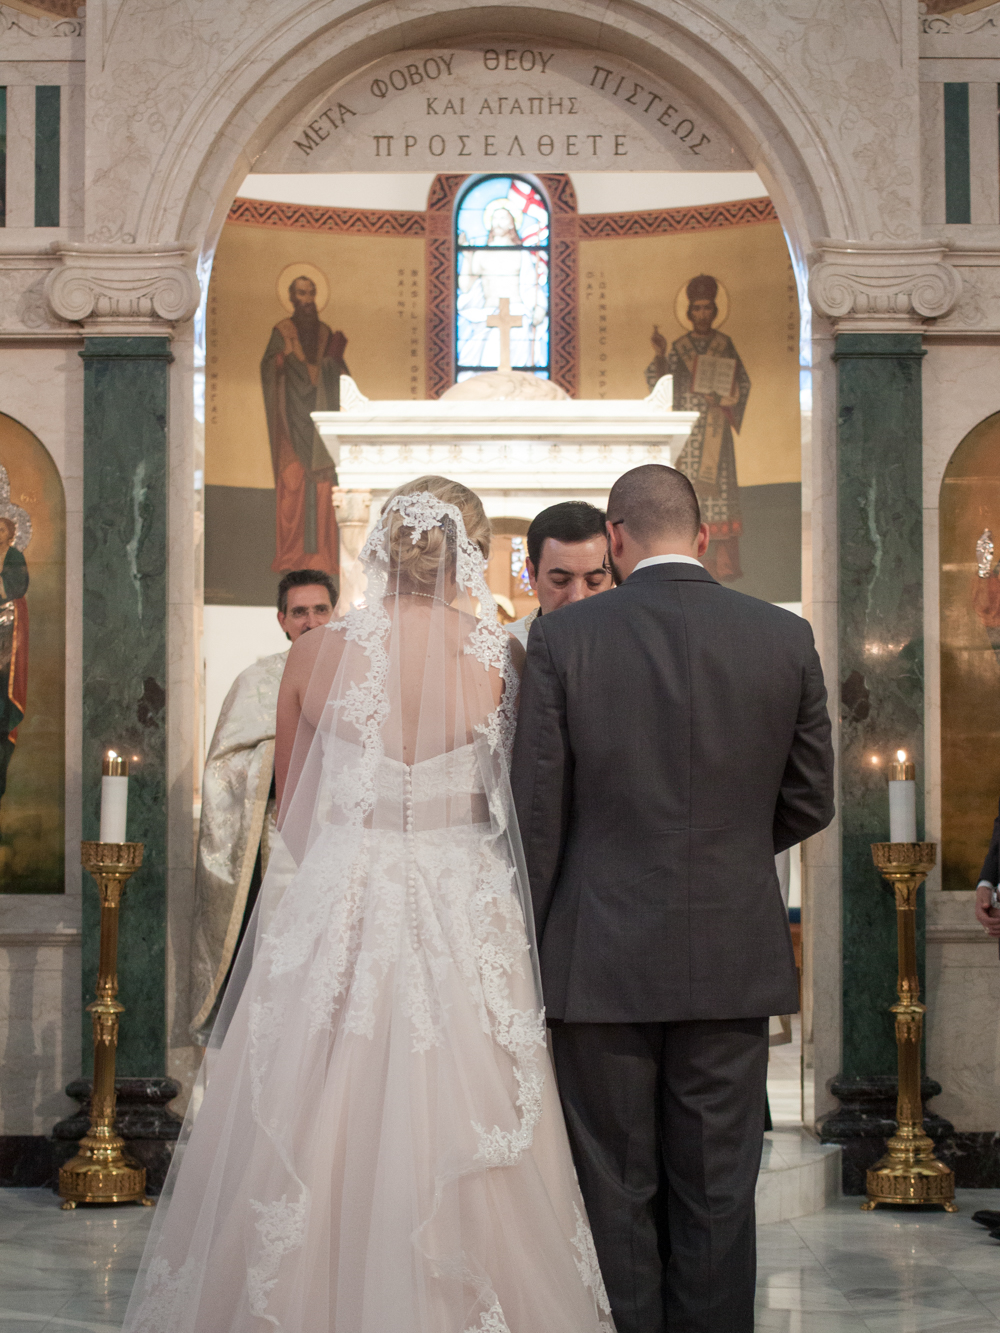 Houston wedding photographer - Christine Gosch - Houston film photographer - greek wedding in Houston - Annunciation Greek Orthodox church in Houston, Texas - Houston wedding planner -29.jpg